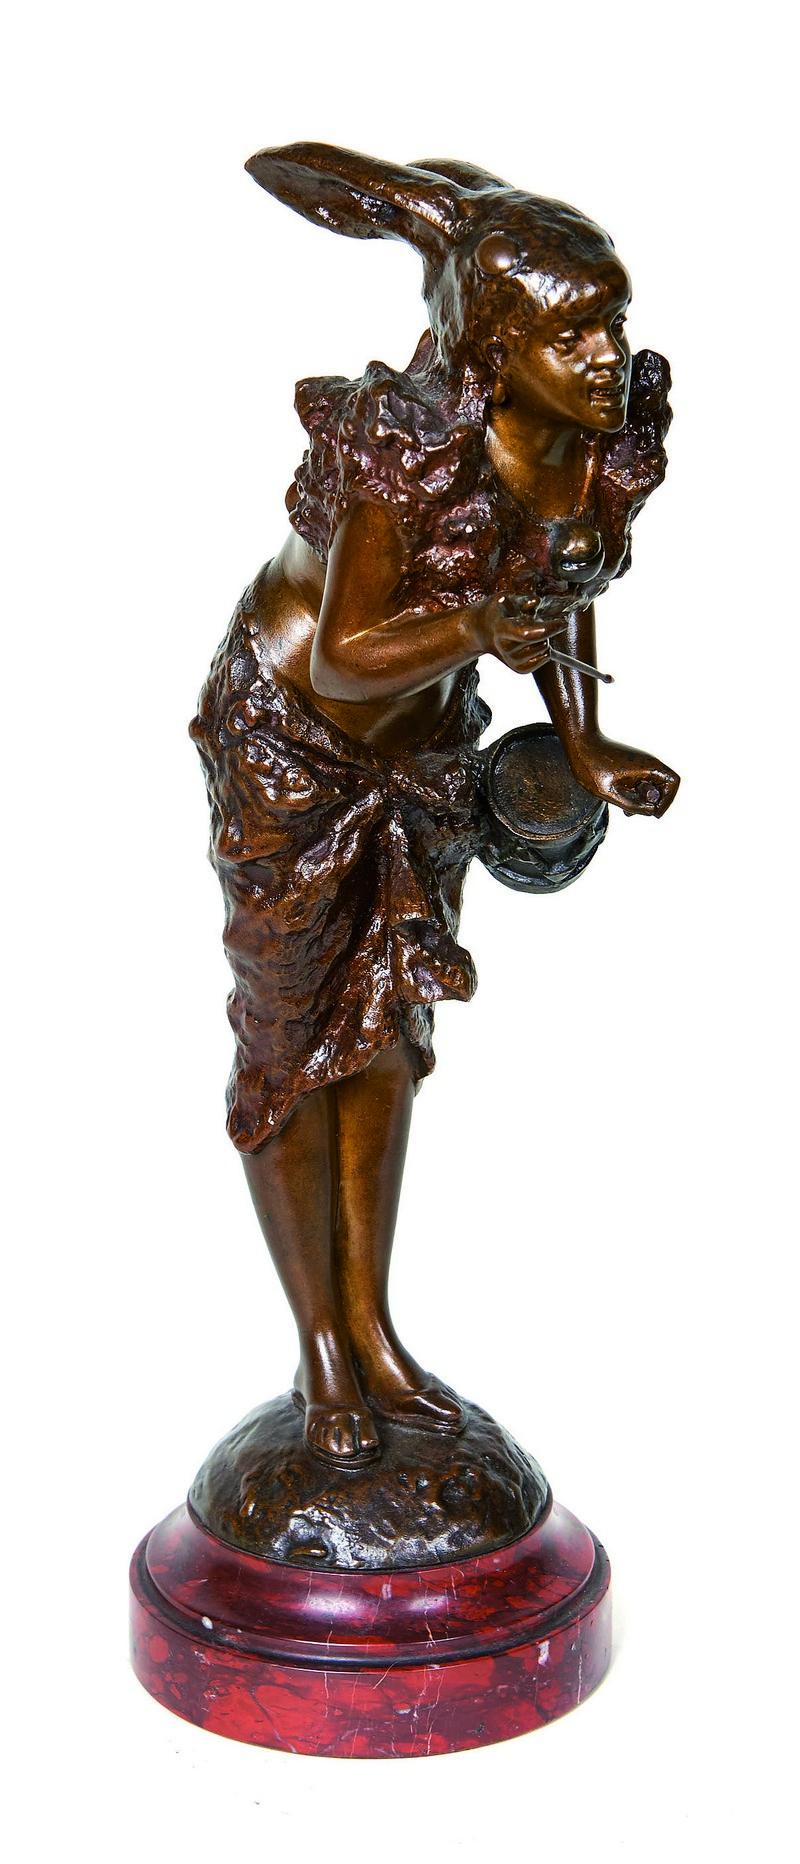 ALFRED GRÉVIN. Tamborilera. Escultura Art Nouveau en bronce. Firmada (s. XIX)